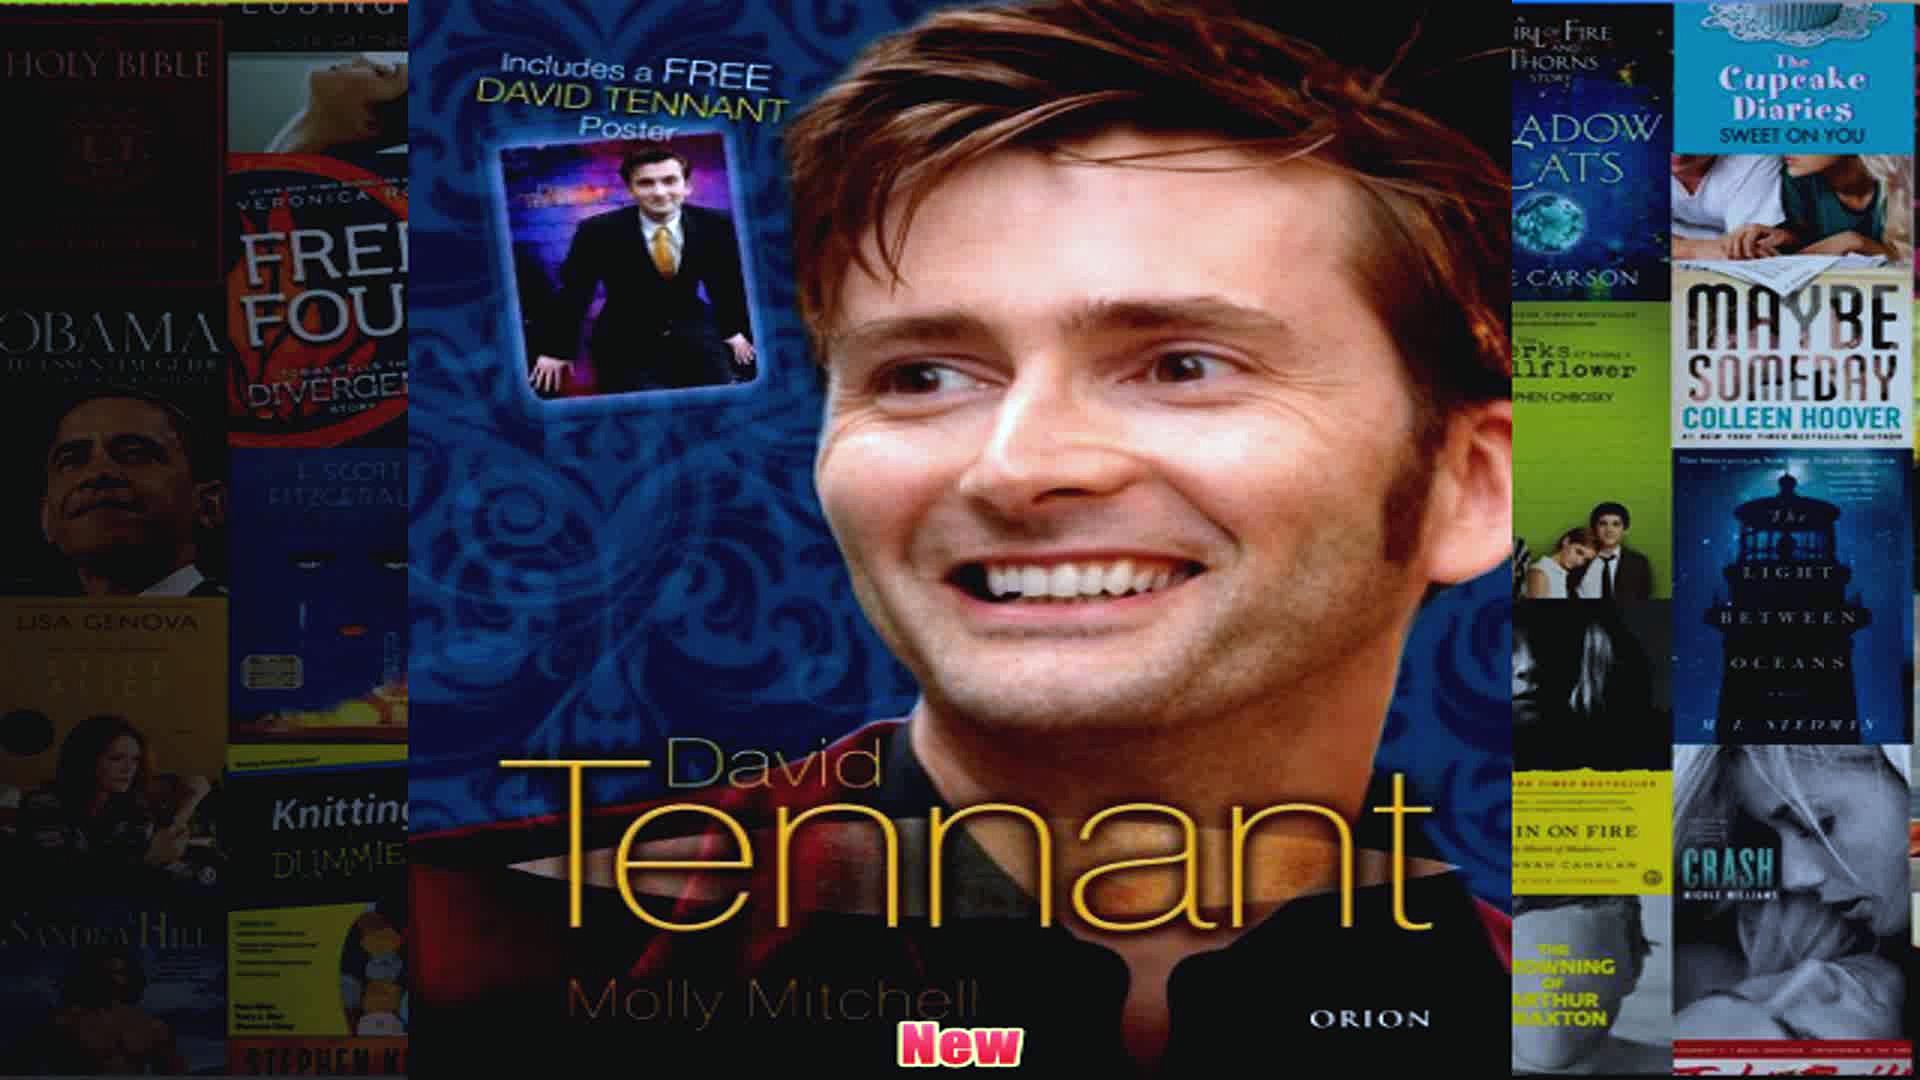 David Tennant Casebook The Whos Who